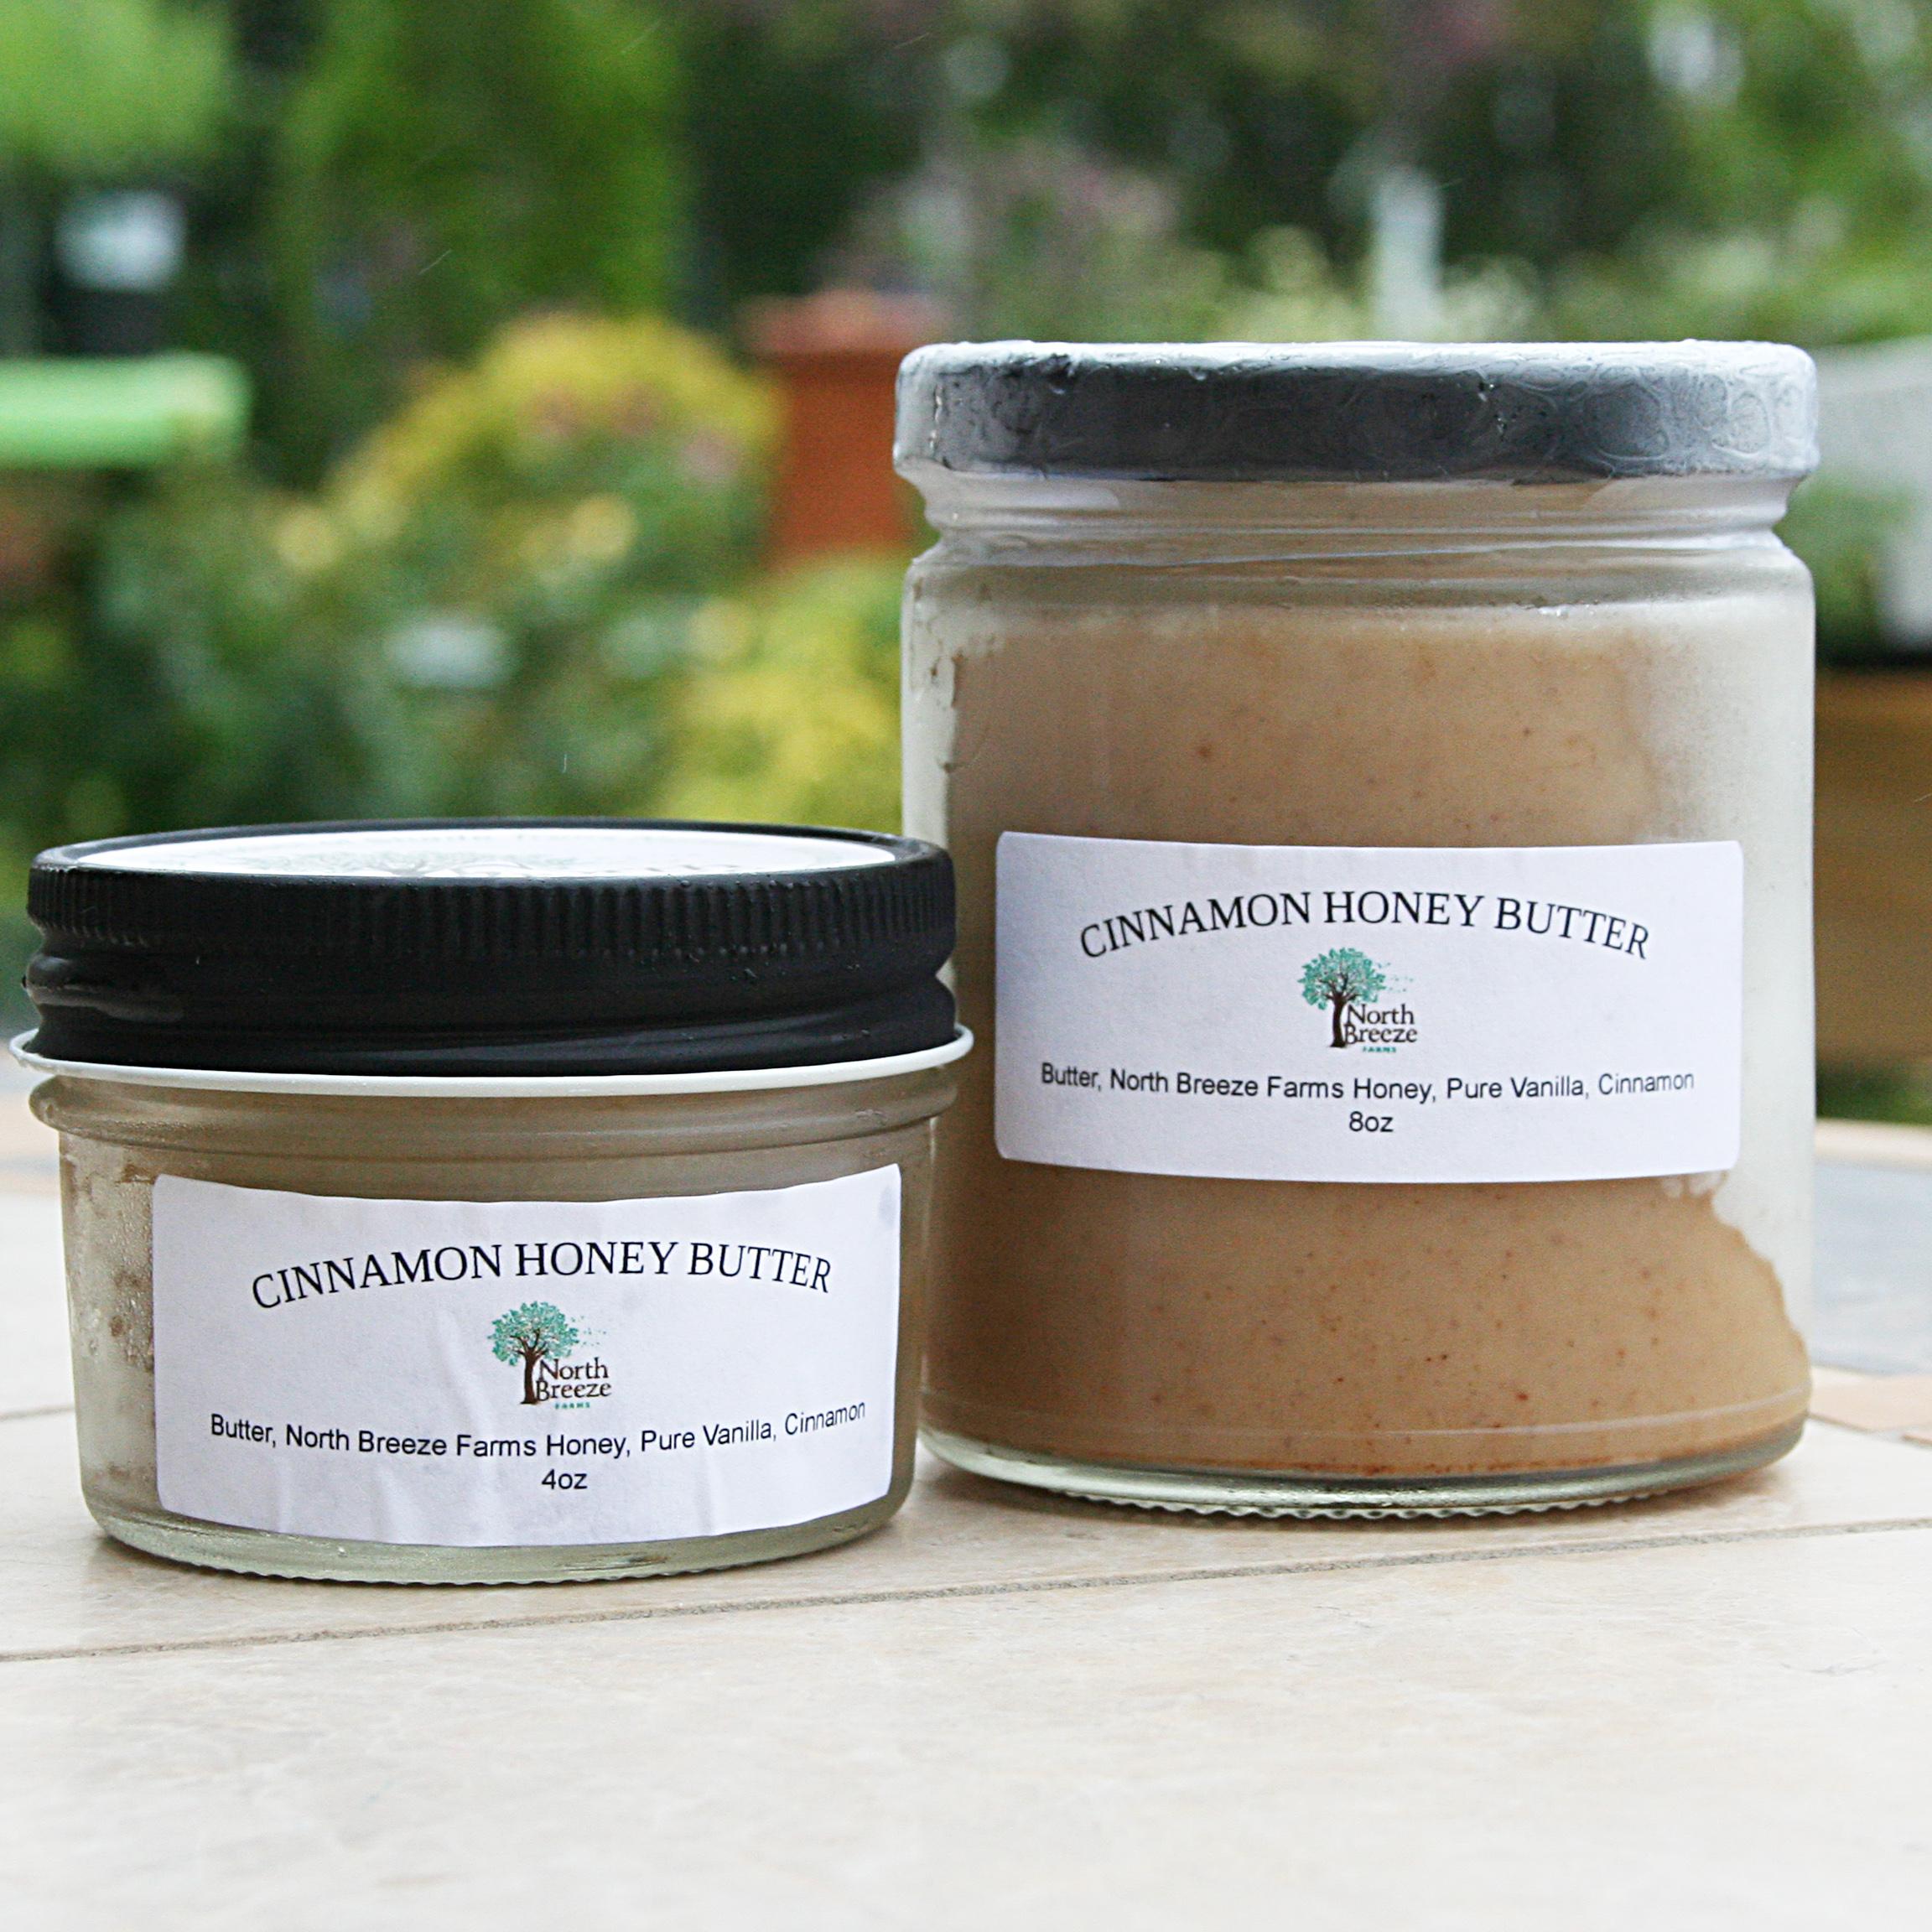 Cinnamon Honey Butter 4 oz $6.50 8 oz $12.50